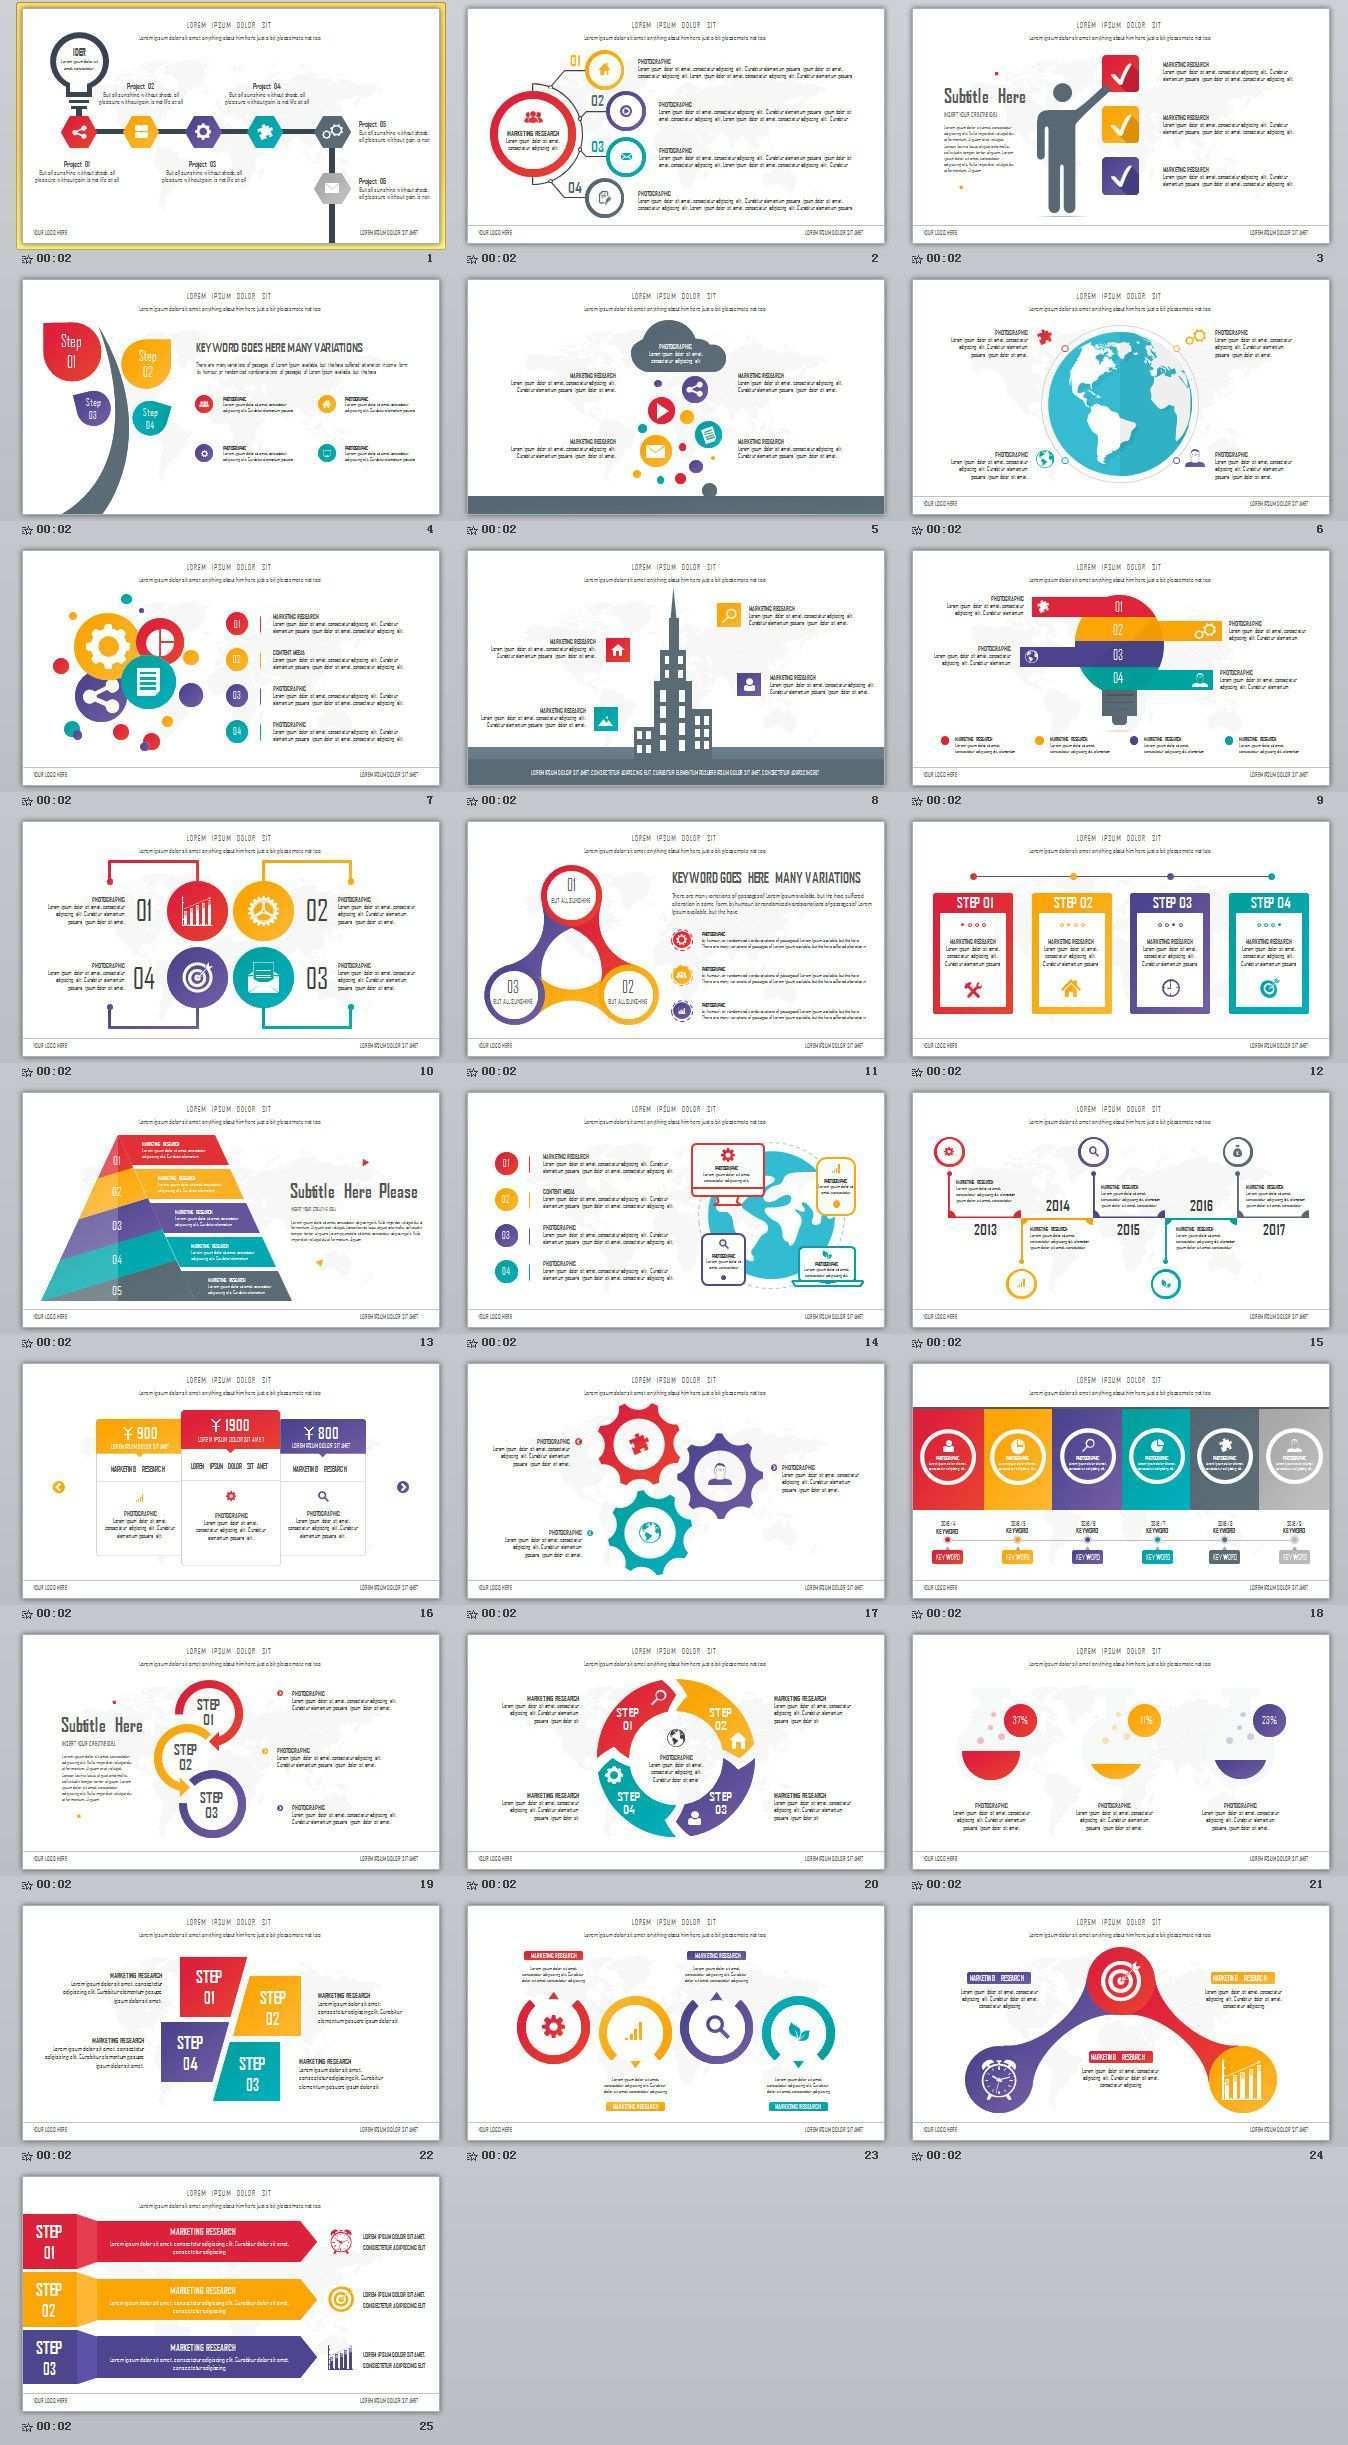 25 Best Infographic Presentation Powerpoint Templates On Behance Powerpoint Templates Modelos Infograficos Ideias Para Apresentacoes Organograma Empresarial